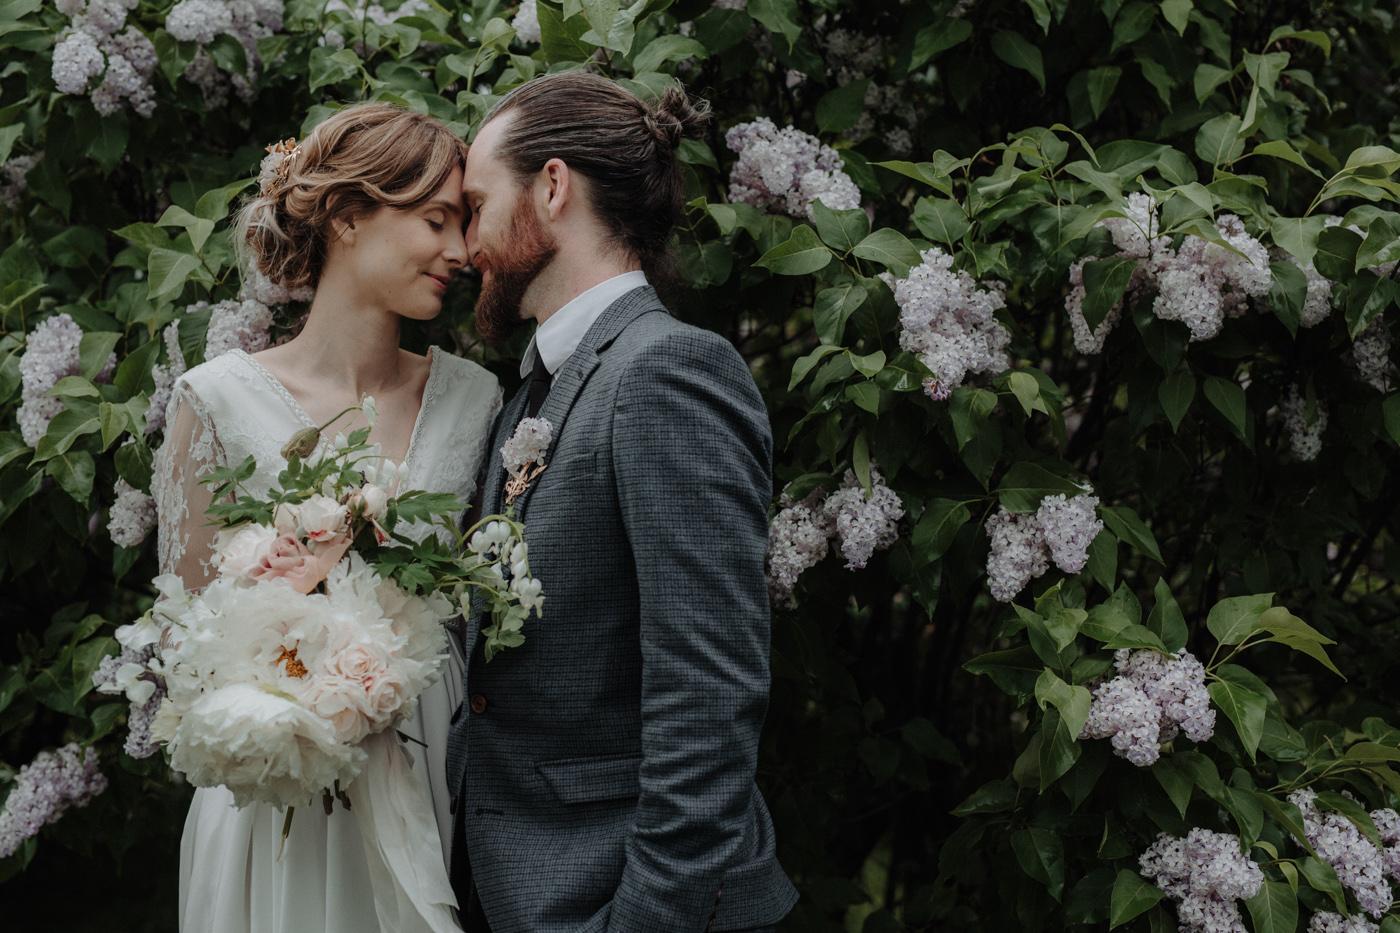 Erin-Mike-Intimate-Vintage-Wedding-Shelburne-Farms-Vermont -121.jpg